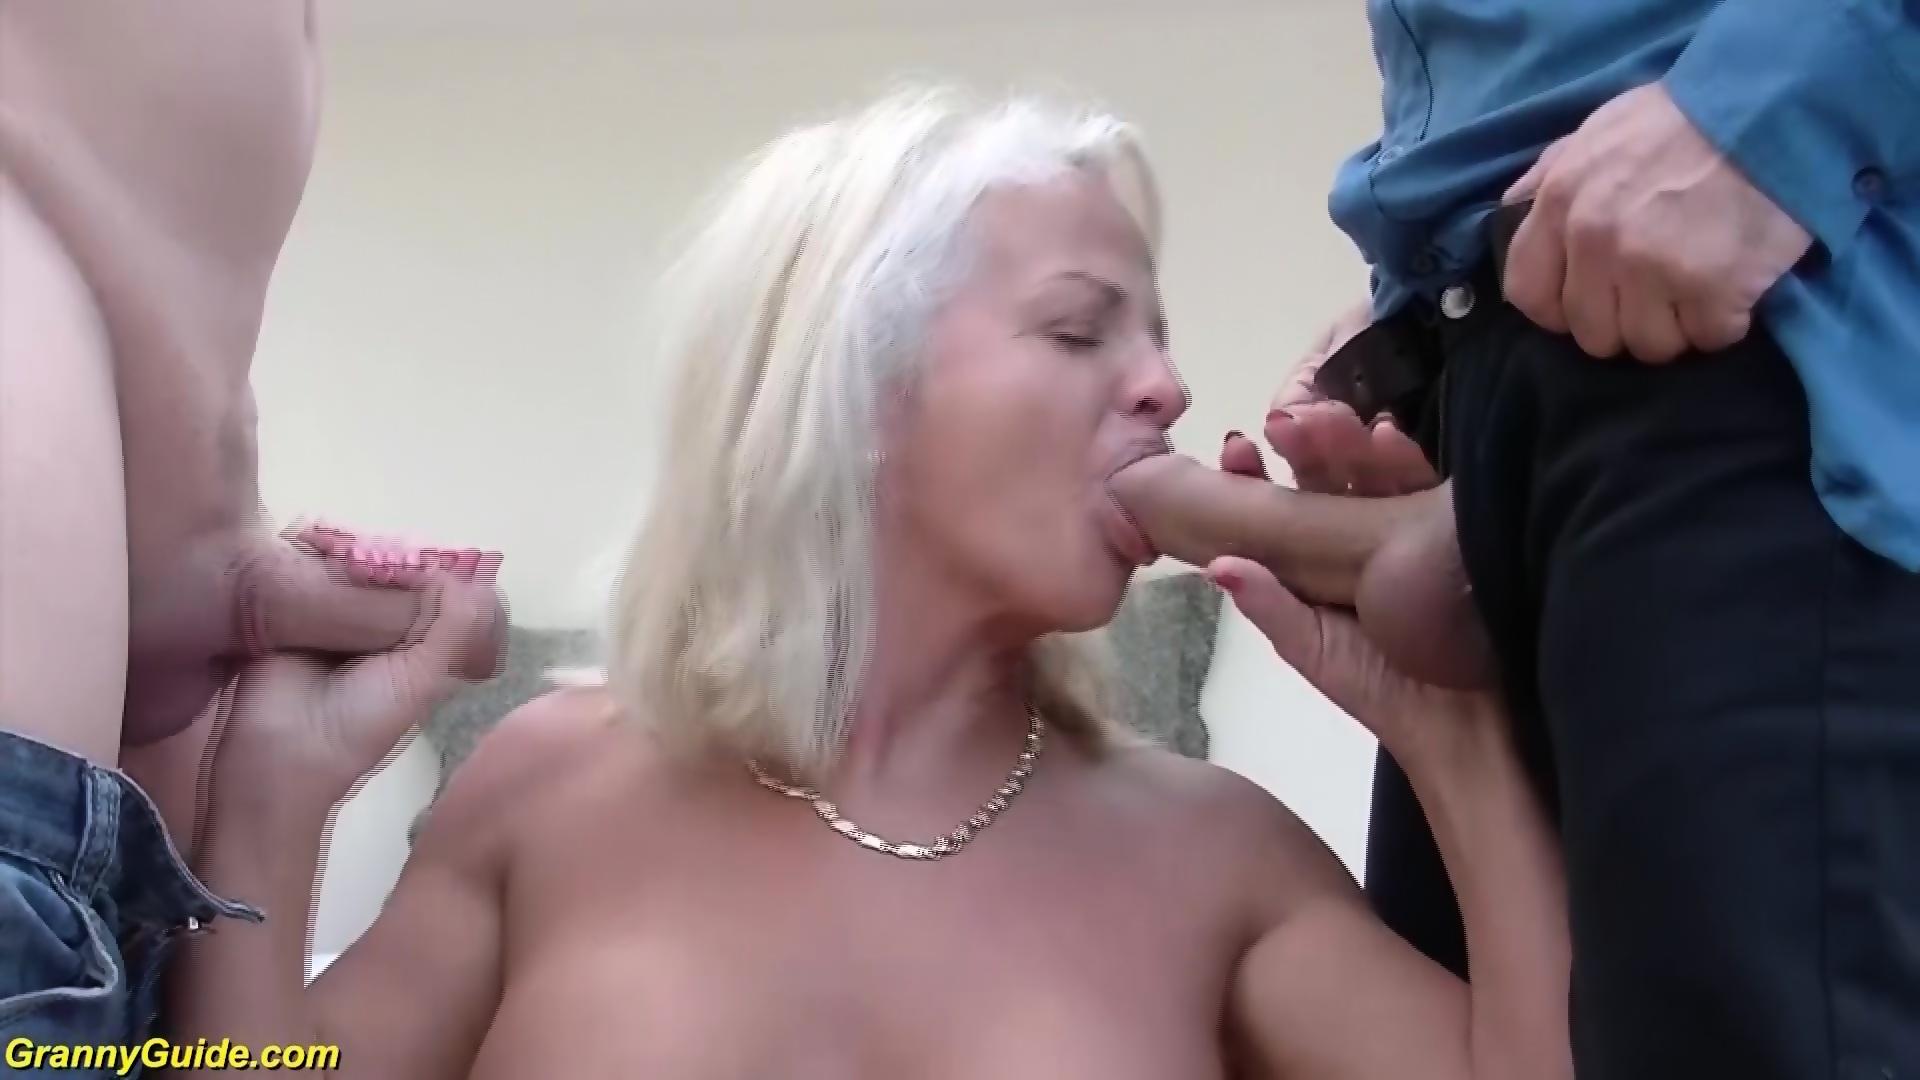 join ebony twerking handjob cock load cumm on face share your opinion. something